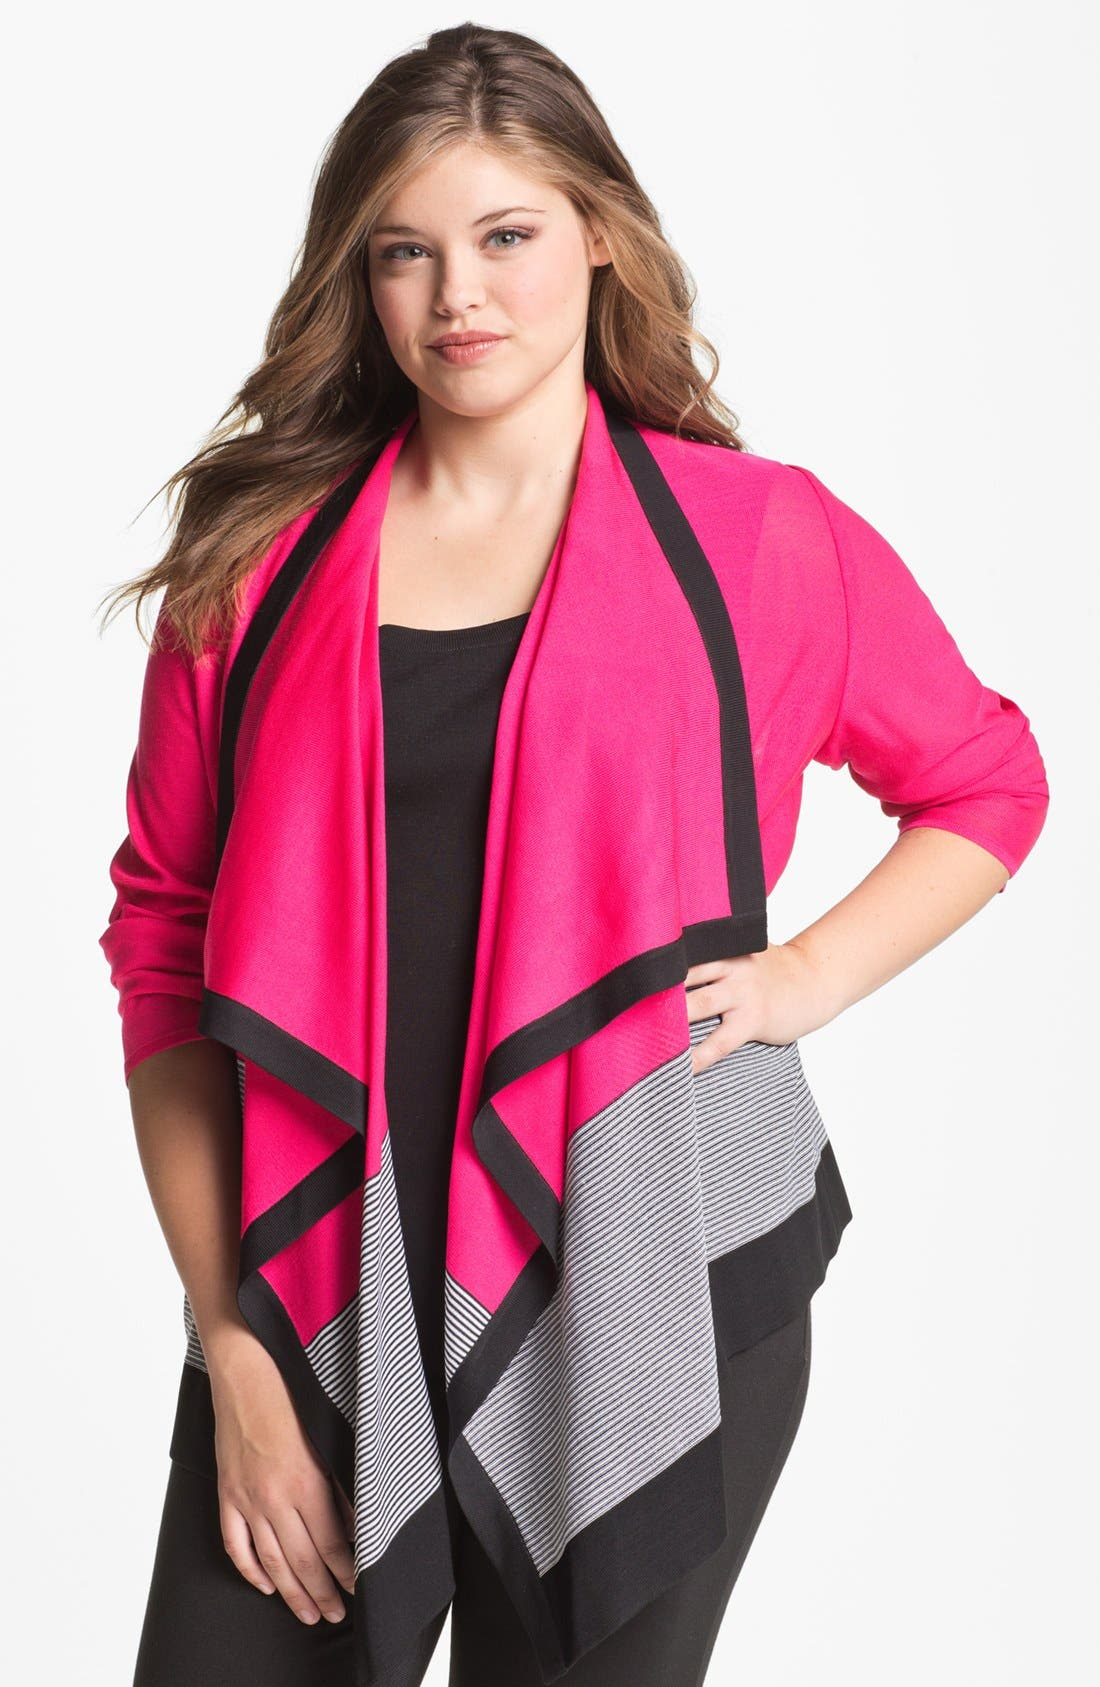 Alternate Image 1 Selected - Exclusively Misook 'Jenny' Drape Front Cardigan (Plus Size)